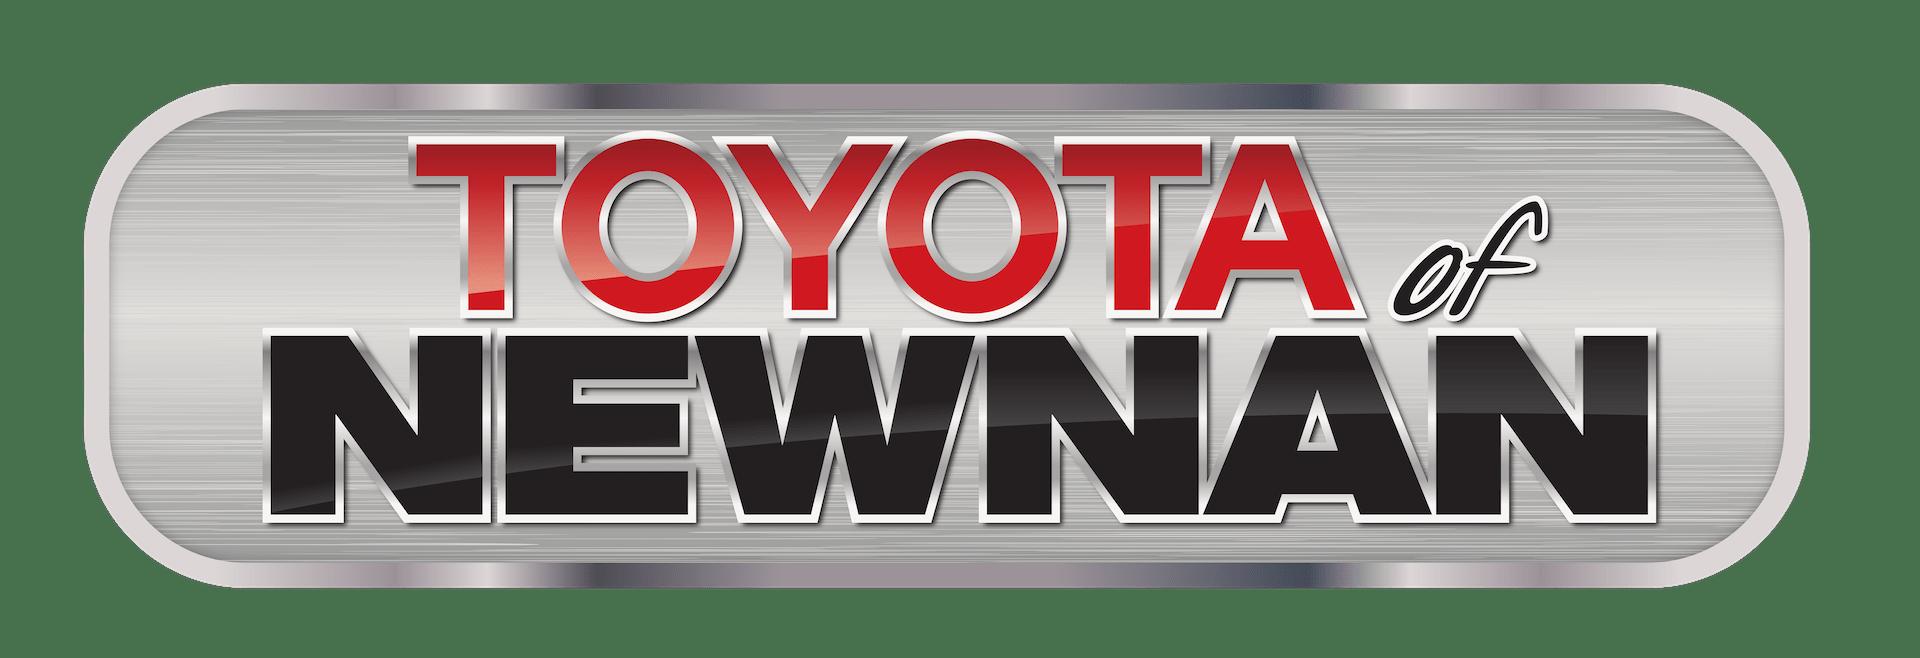 Toyota of Newnan banner